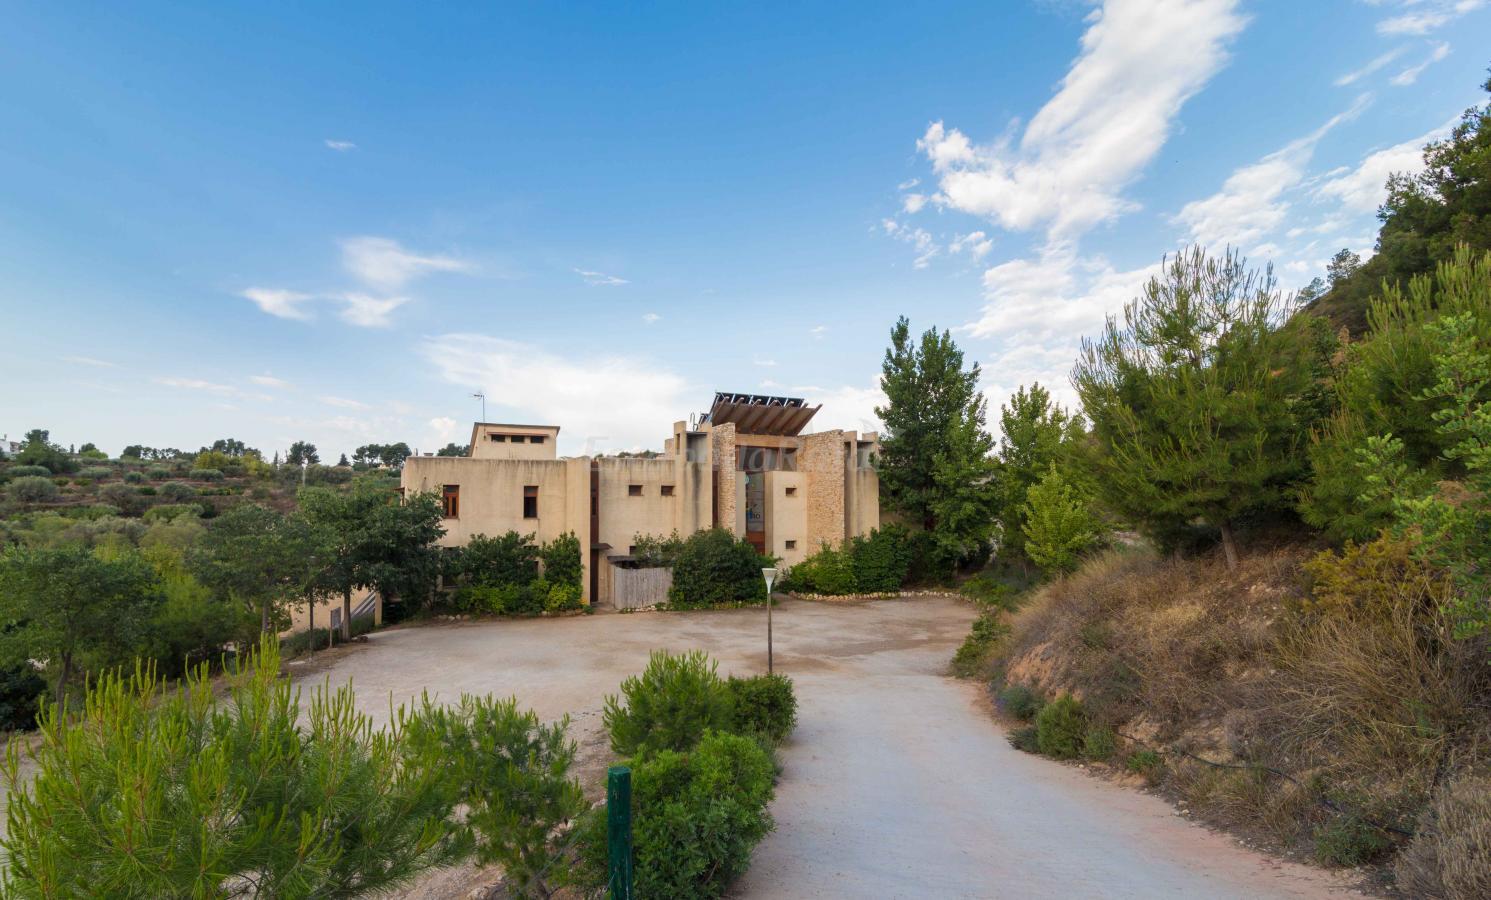 Fotos de albergue rural actio casa rural en alborache valencia - Ofertas casas rurales valencia ...